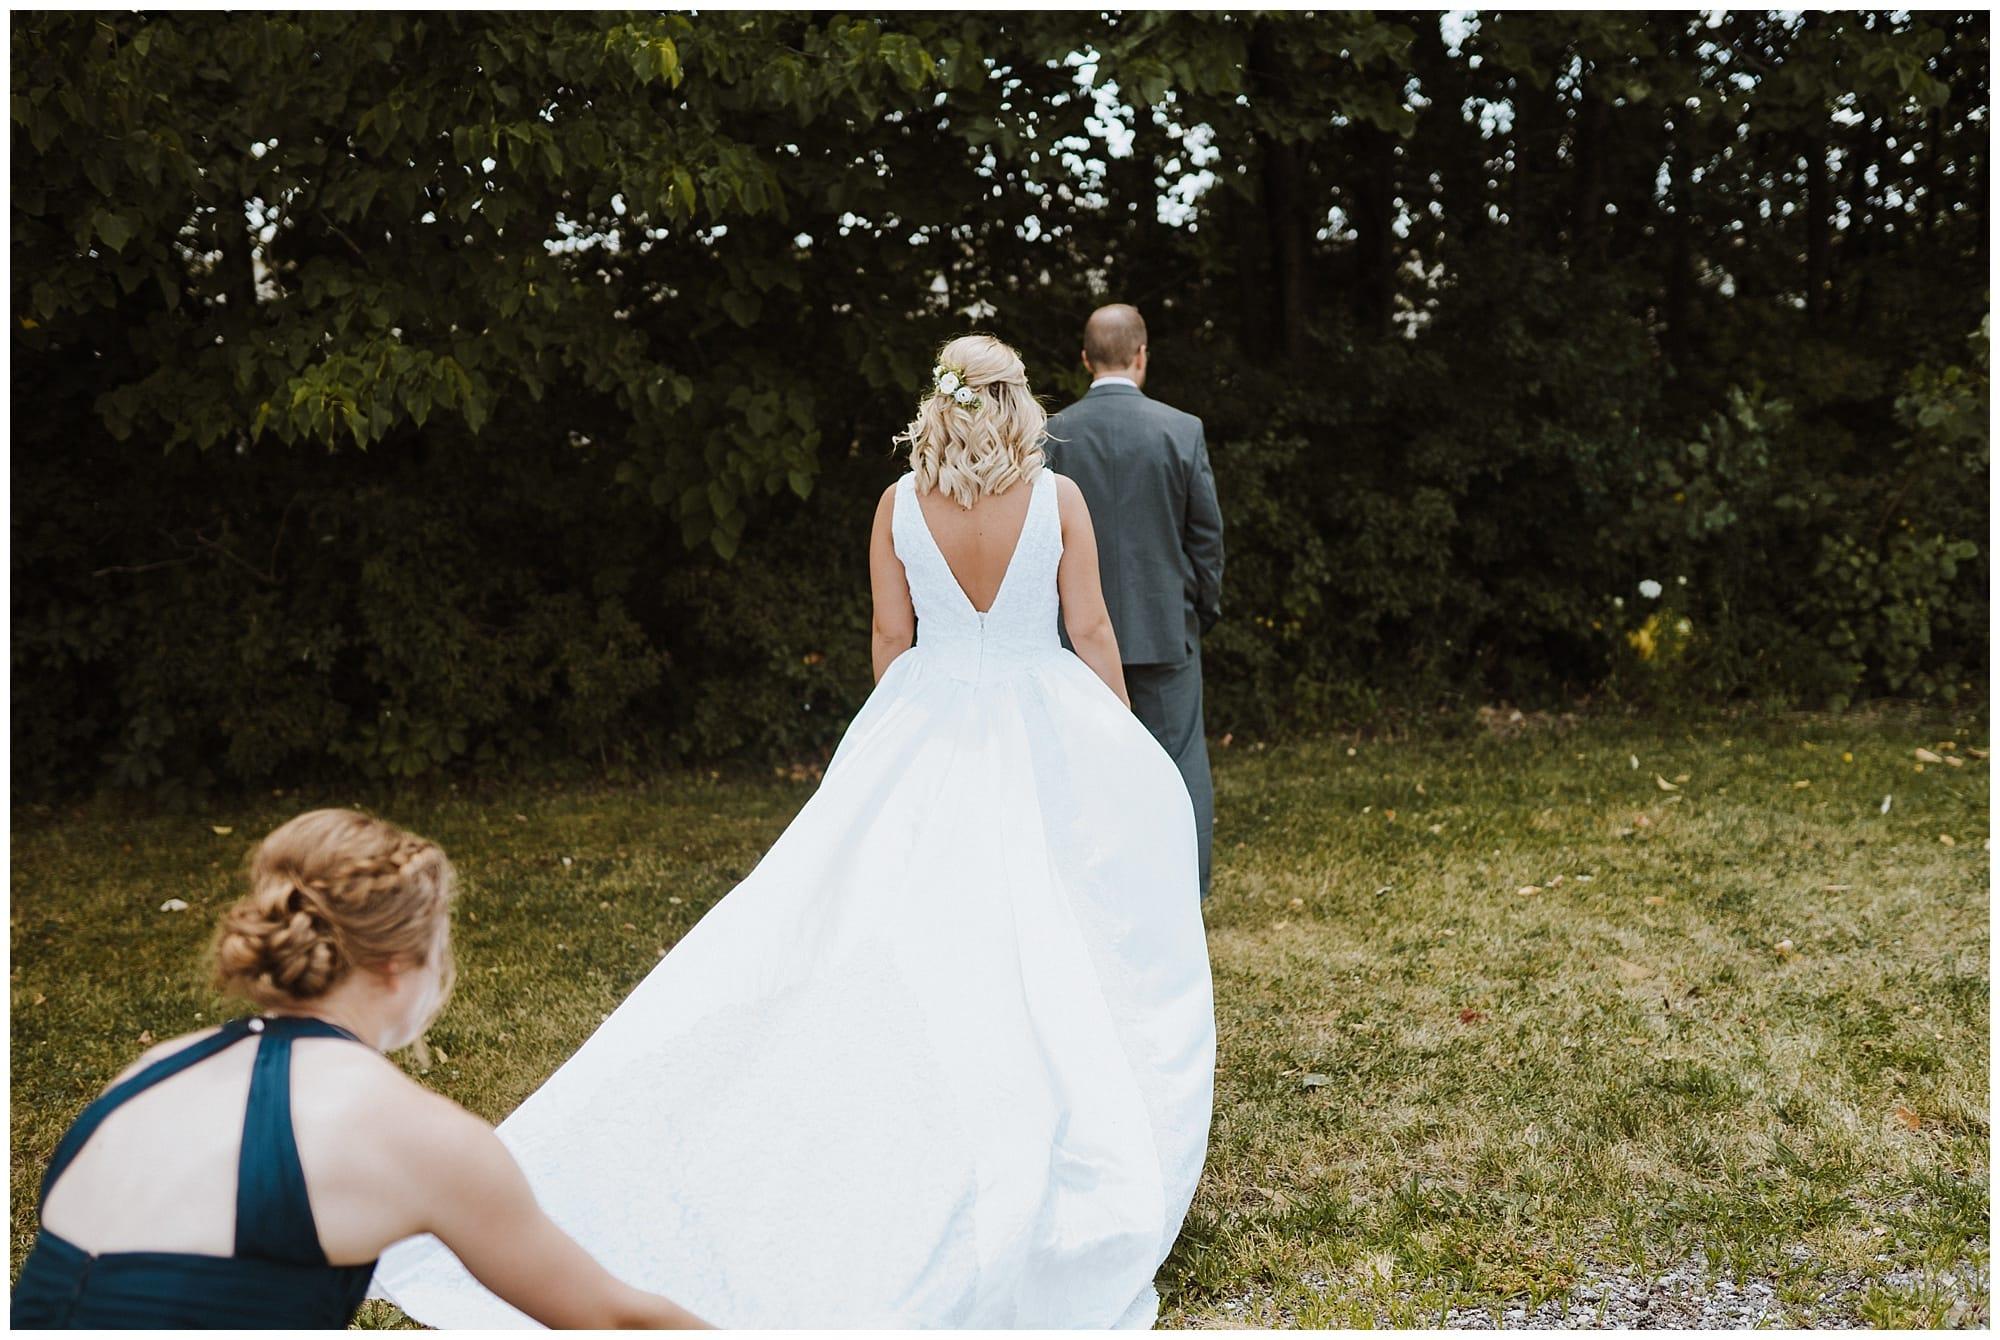 Adrian Michigan Wedding Photographer-18.JPG